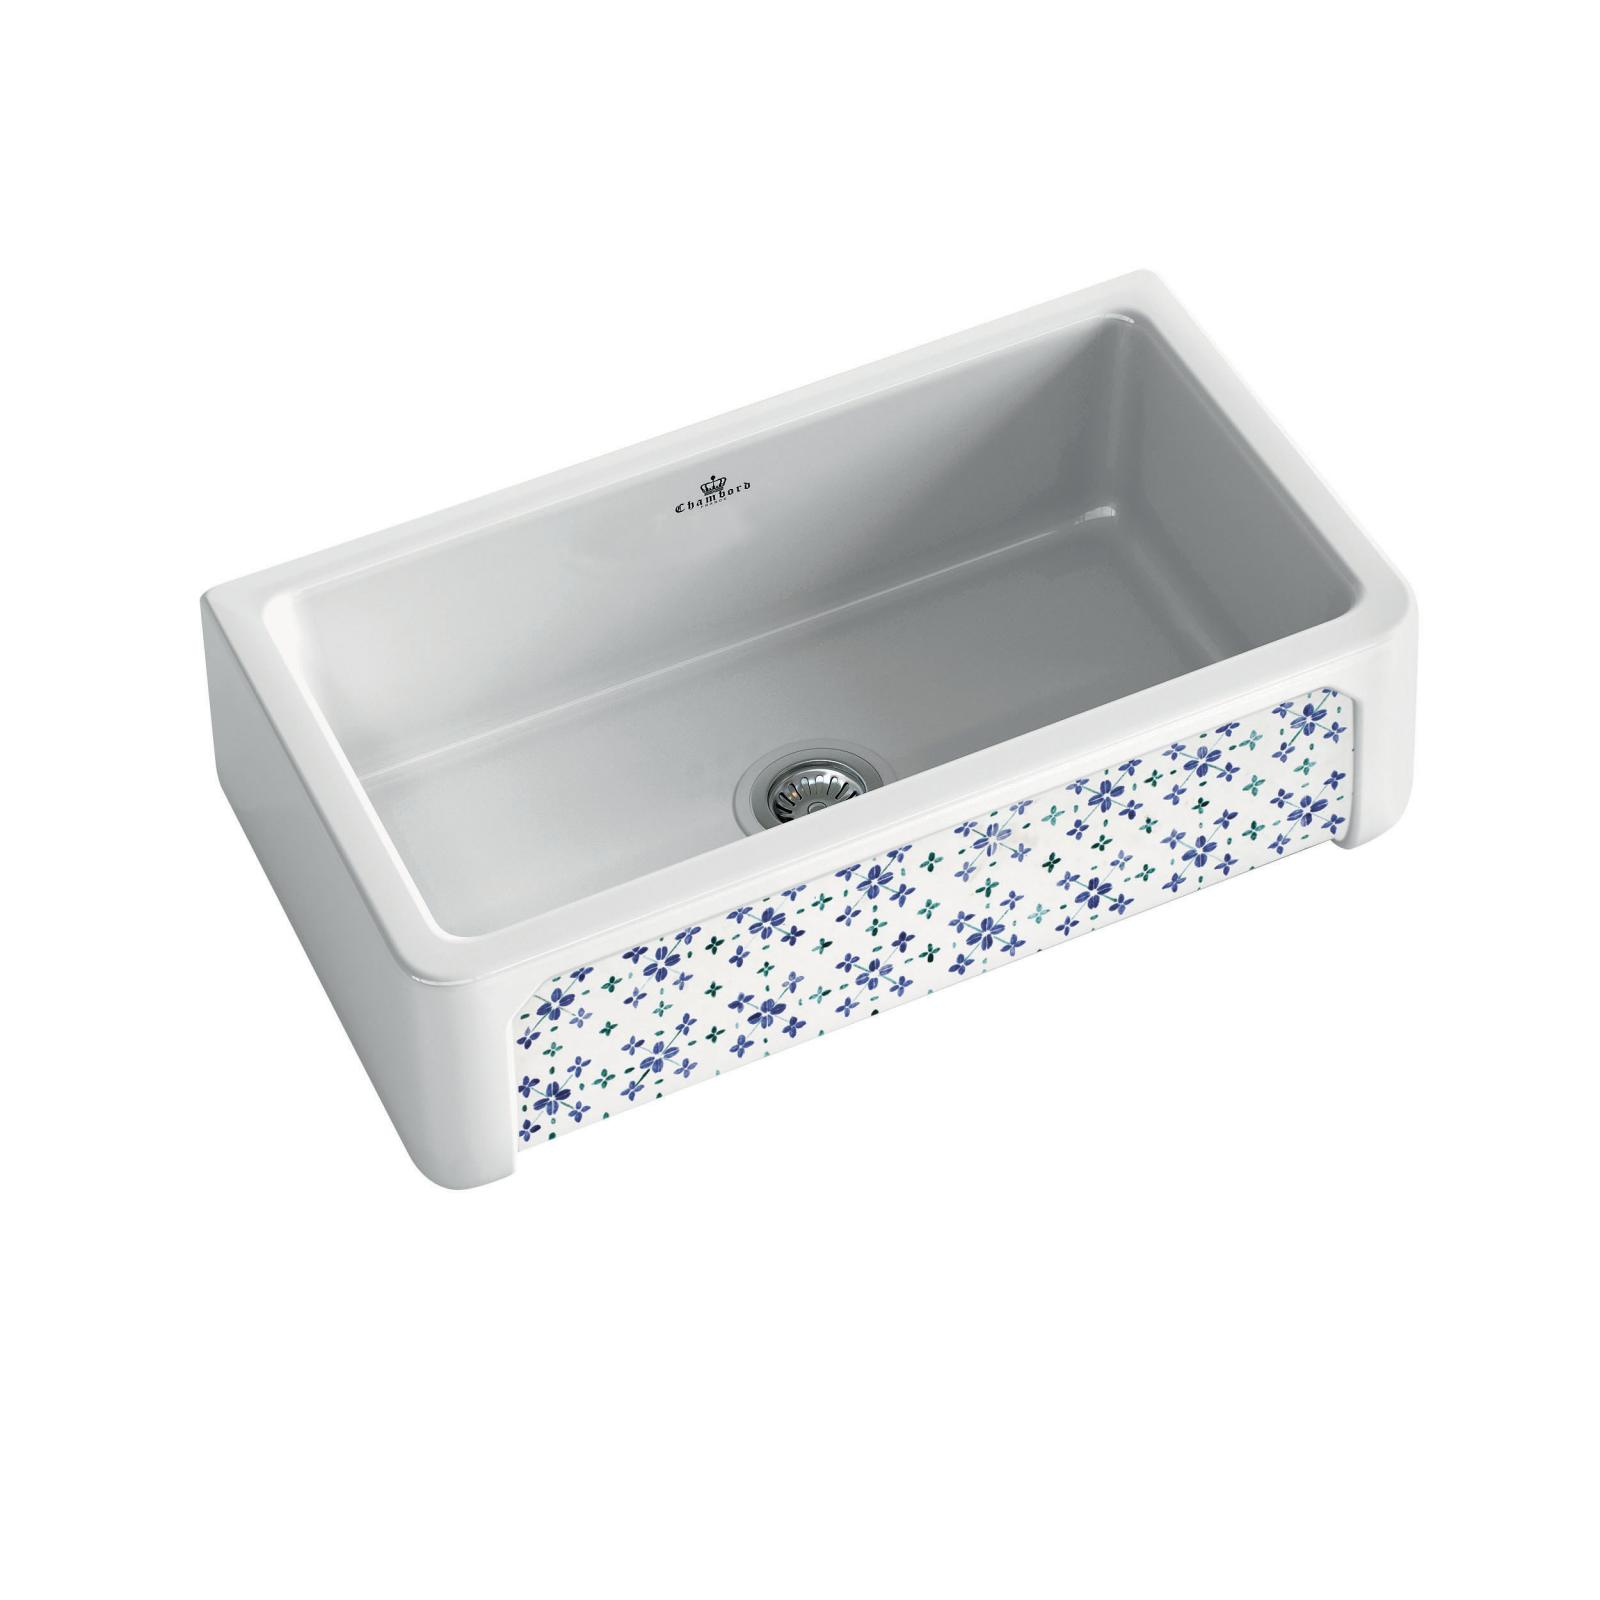 High-quality sink Henri II Bretagne - single bowl, decorated ceramic - ambience 3